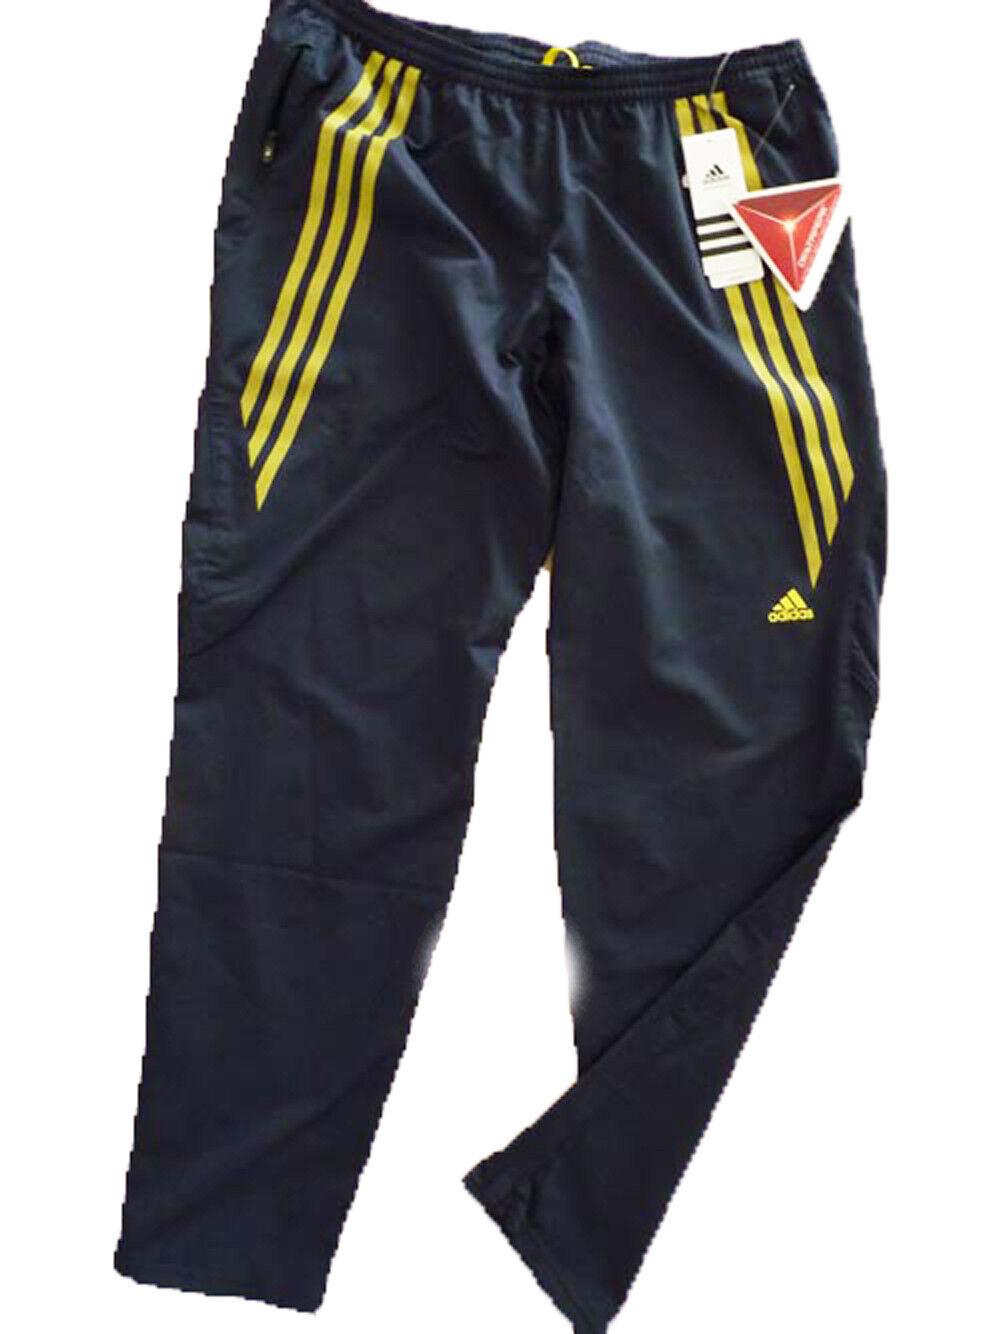 pantaloni fitness donna adidas